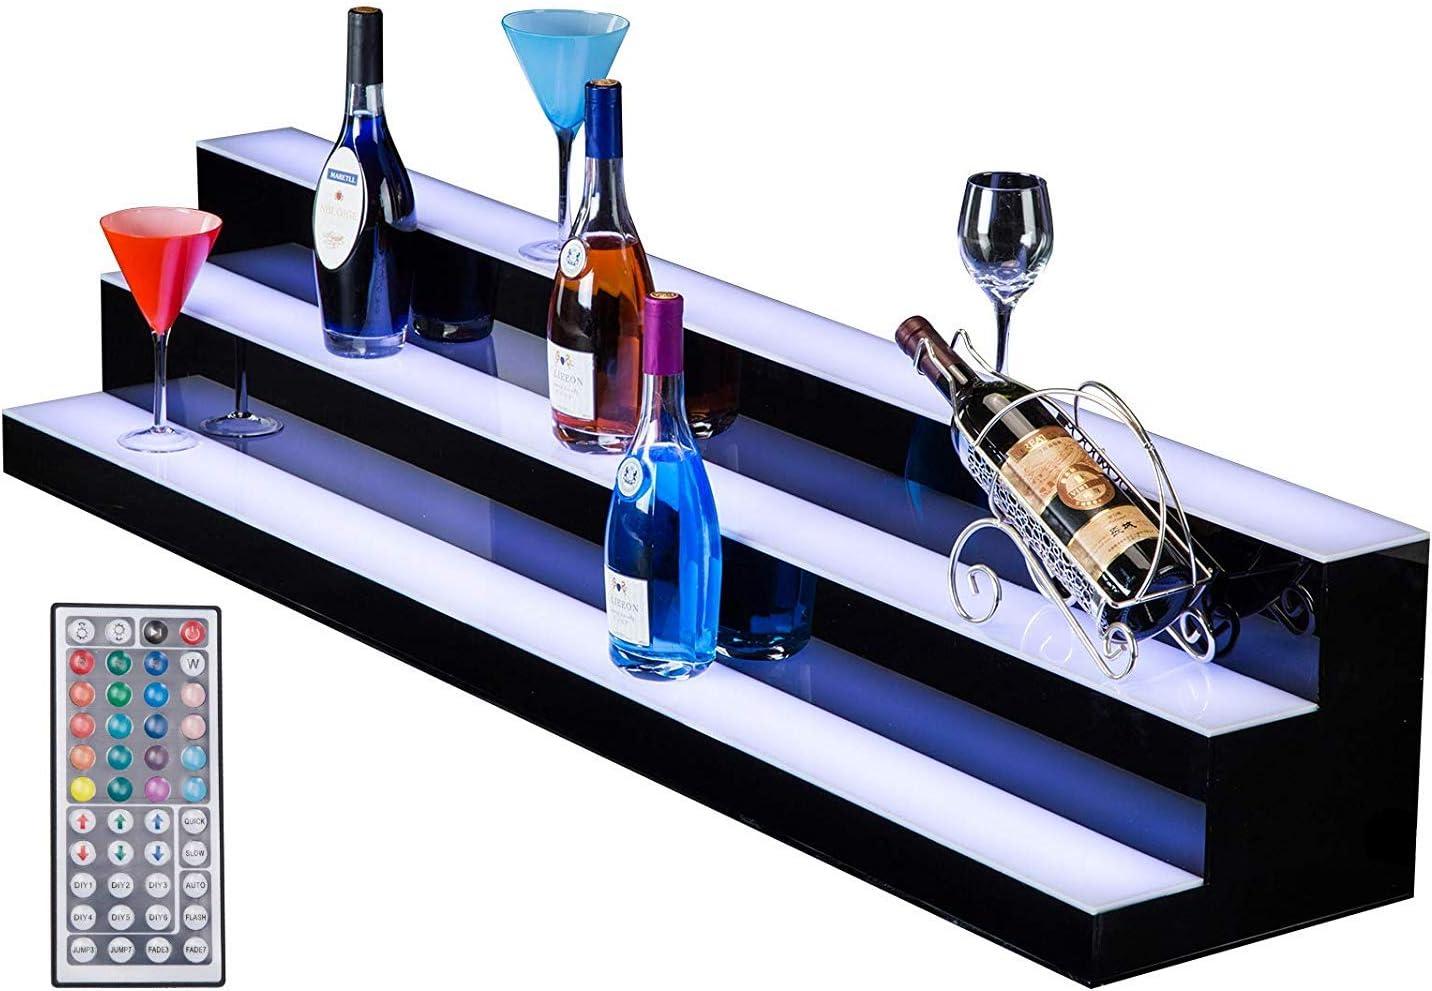 SUNCOO 3 Step LED Lighted Liquor Bottle Display Shelf 60 Inch, Home Bar Bottle Shelf, Drinks Lighting Shelves with Remote Control